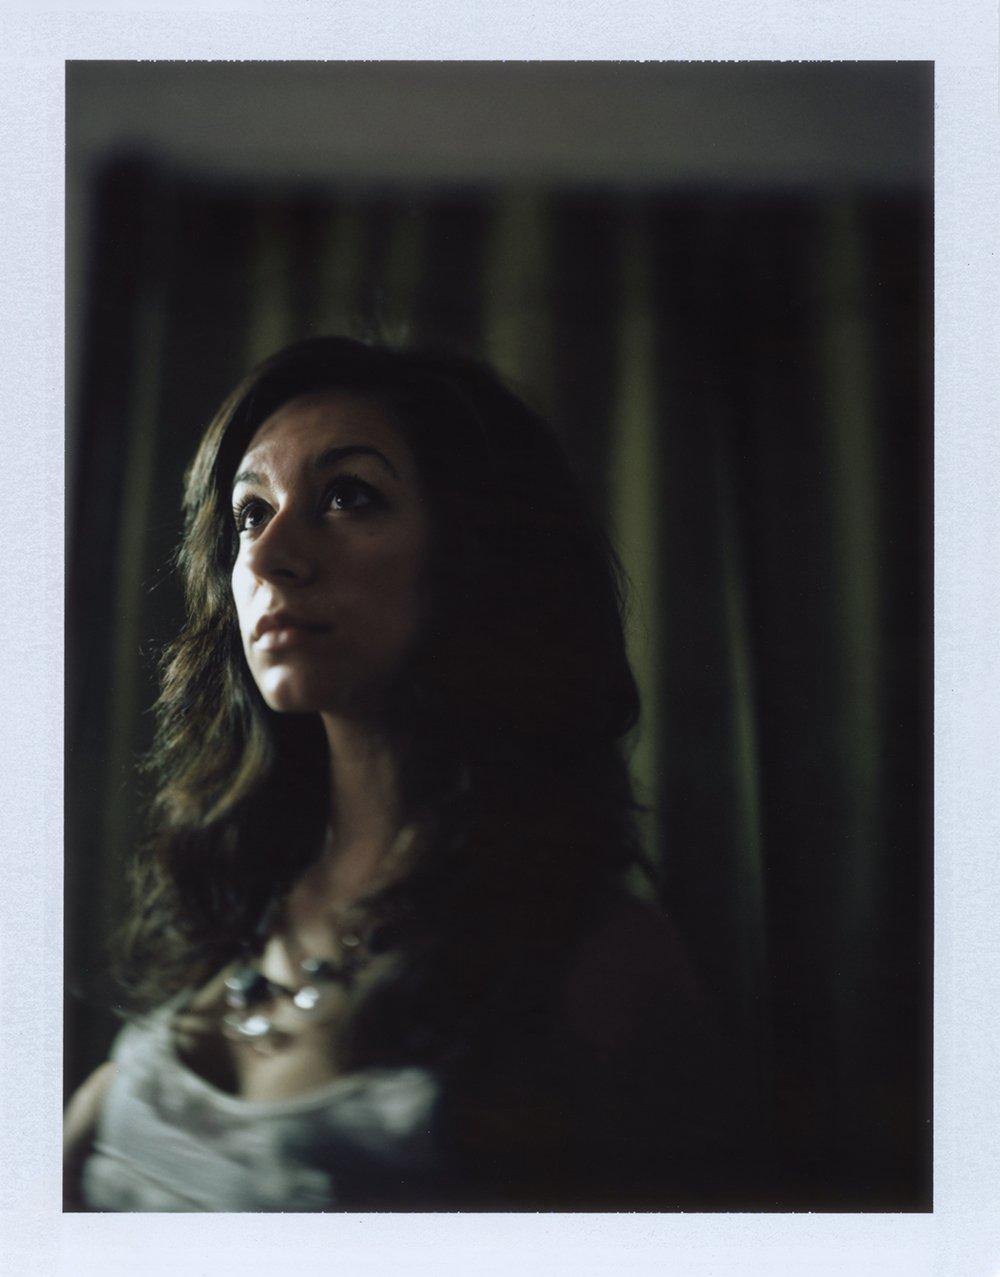 Scott Meivogel: Shooting 4x5 Polaroid Portraits